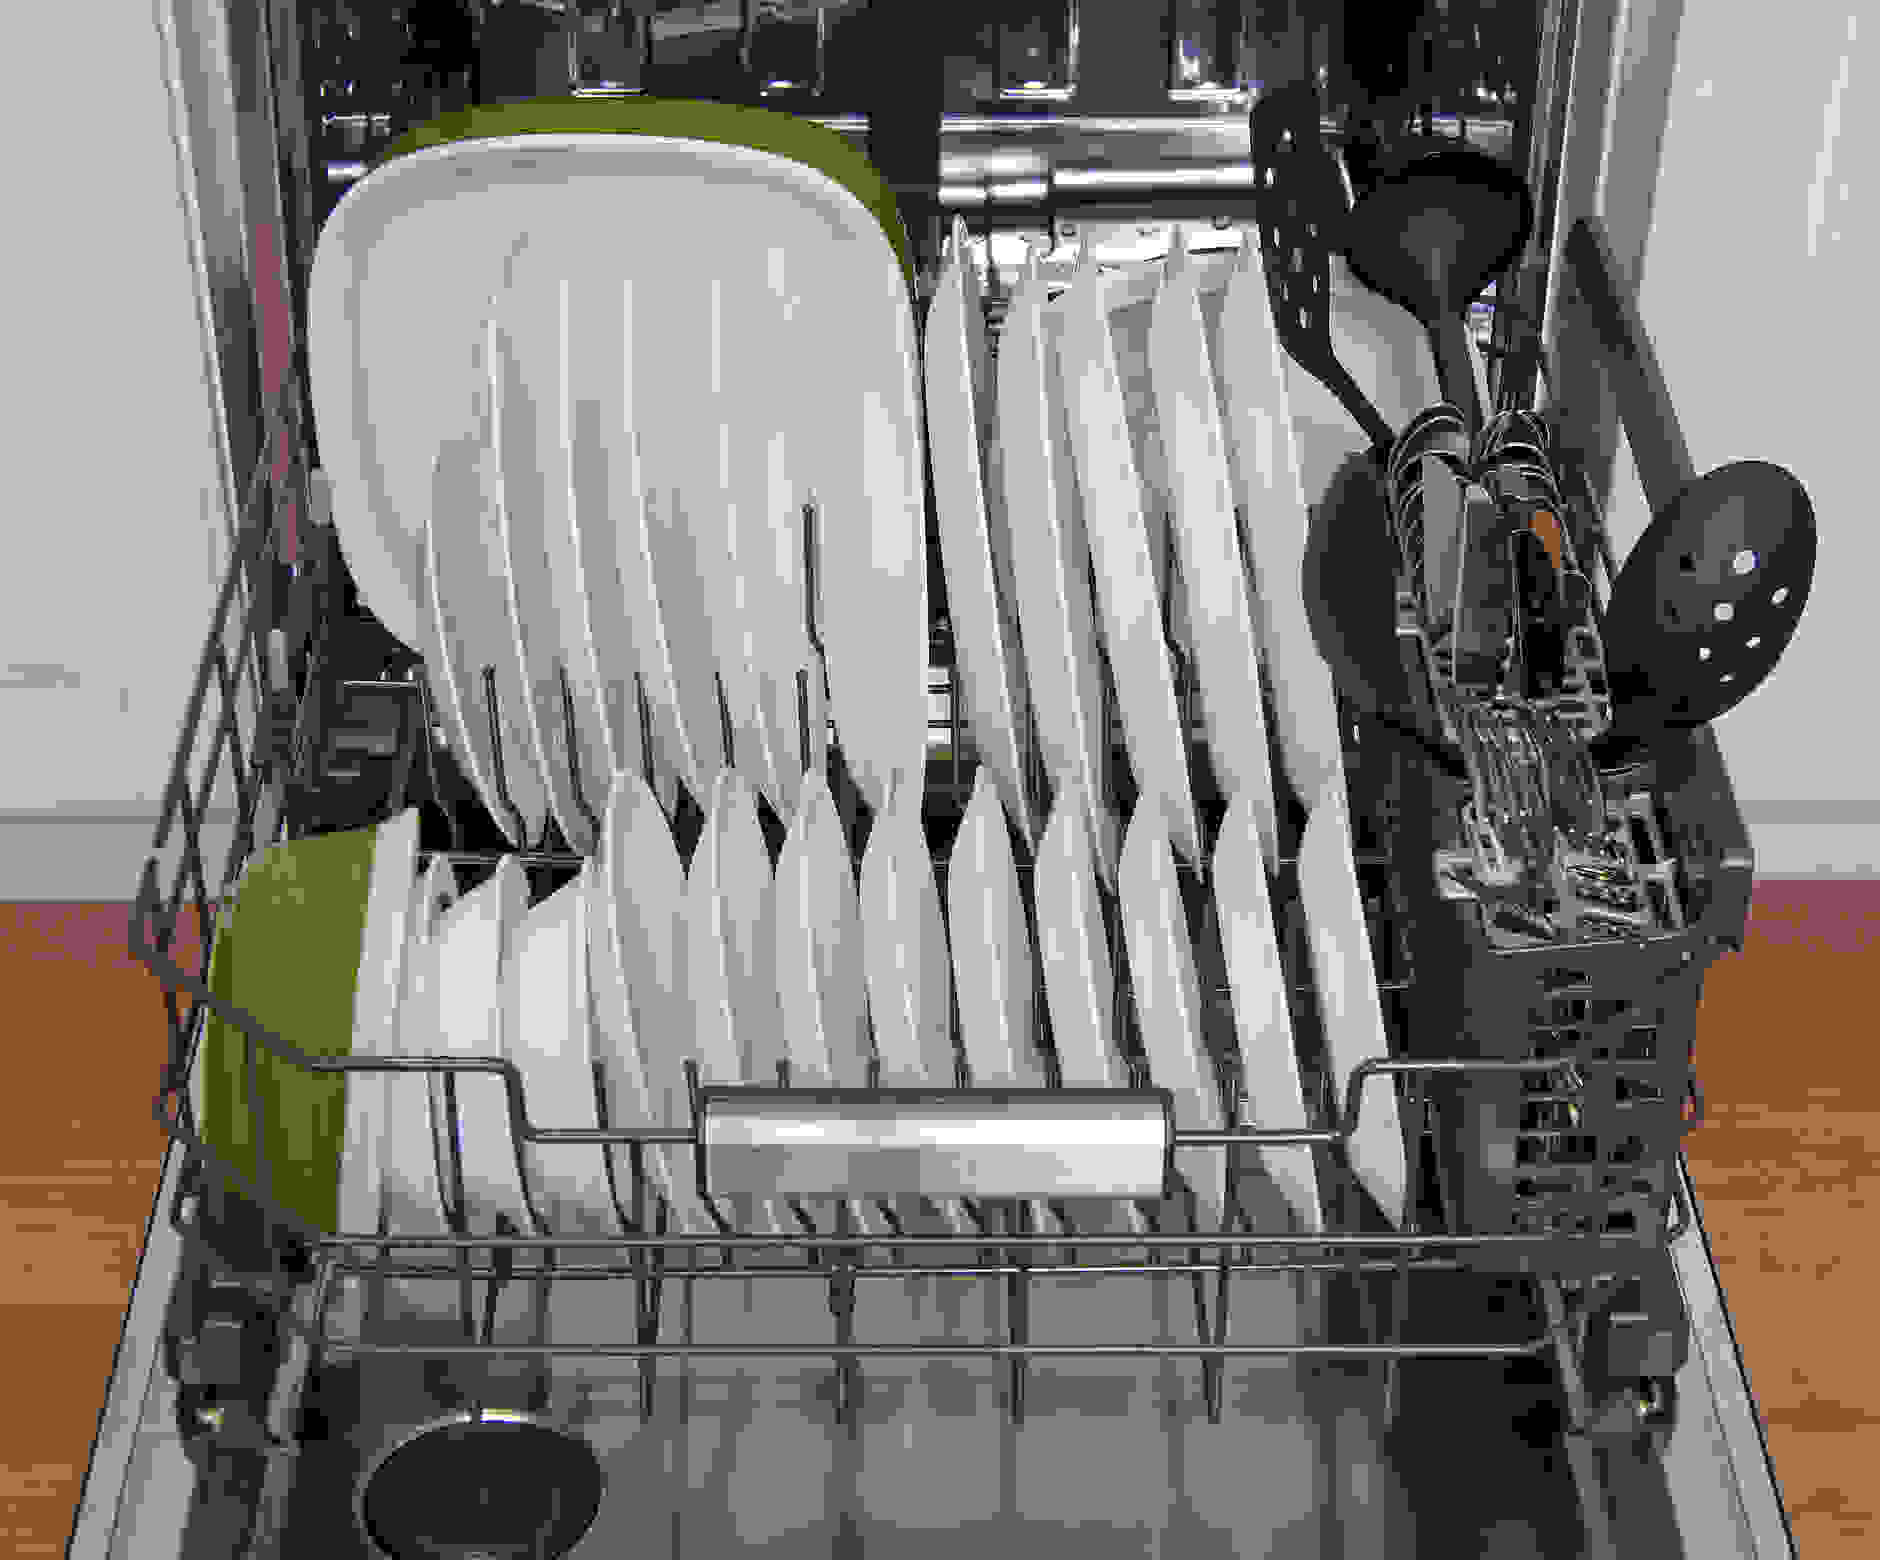 GE Monogram ZDT800SSFSS bottom rack capacity